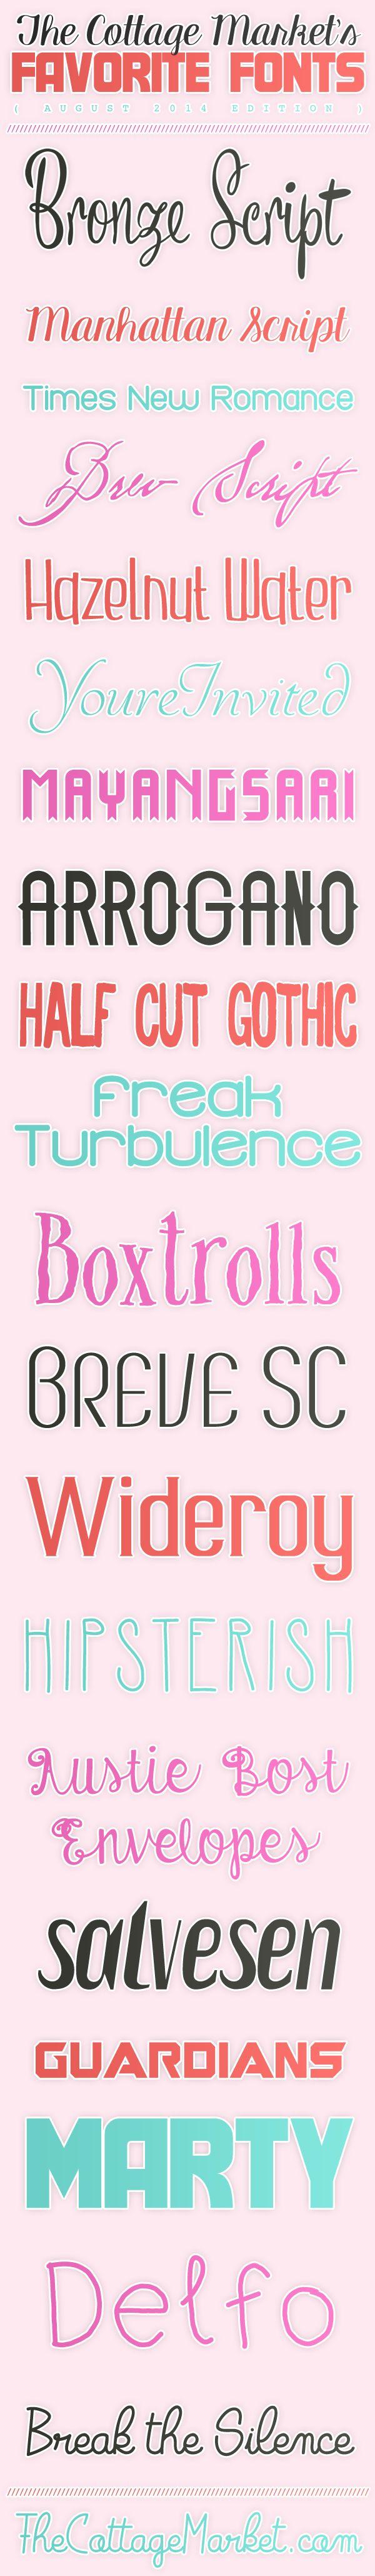 Free Fonts The Cottage Market August 2014 Favorites - The Cottage Market #FreeFonts, #FreeFontCollection, #FunFreeFonts